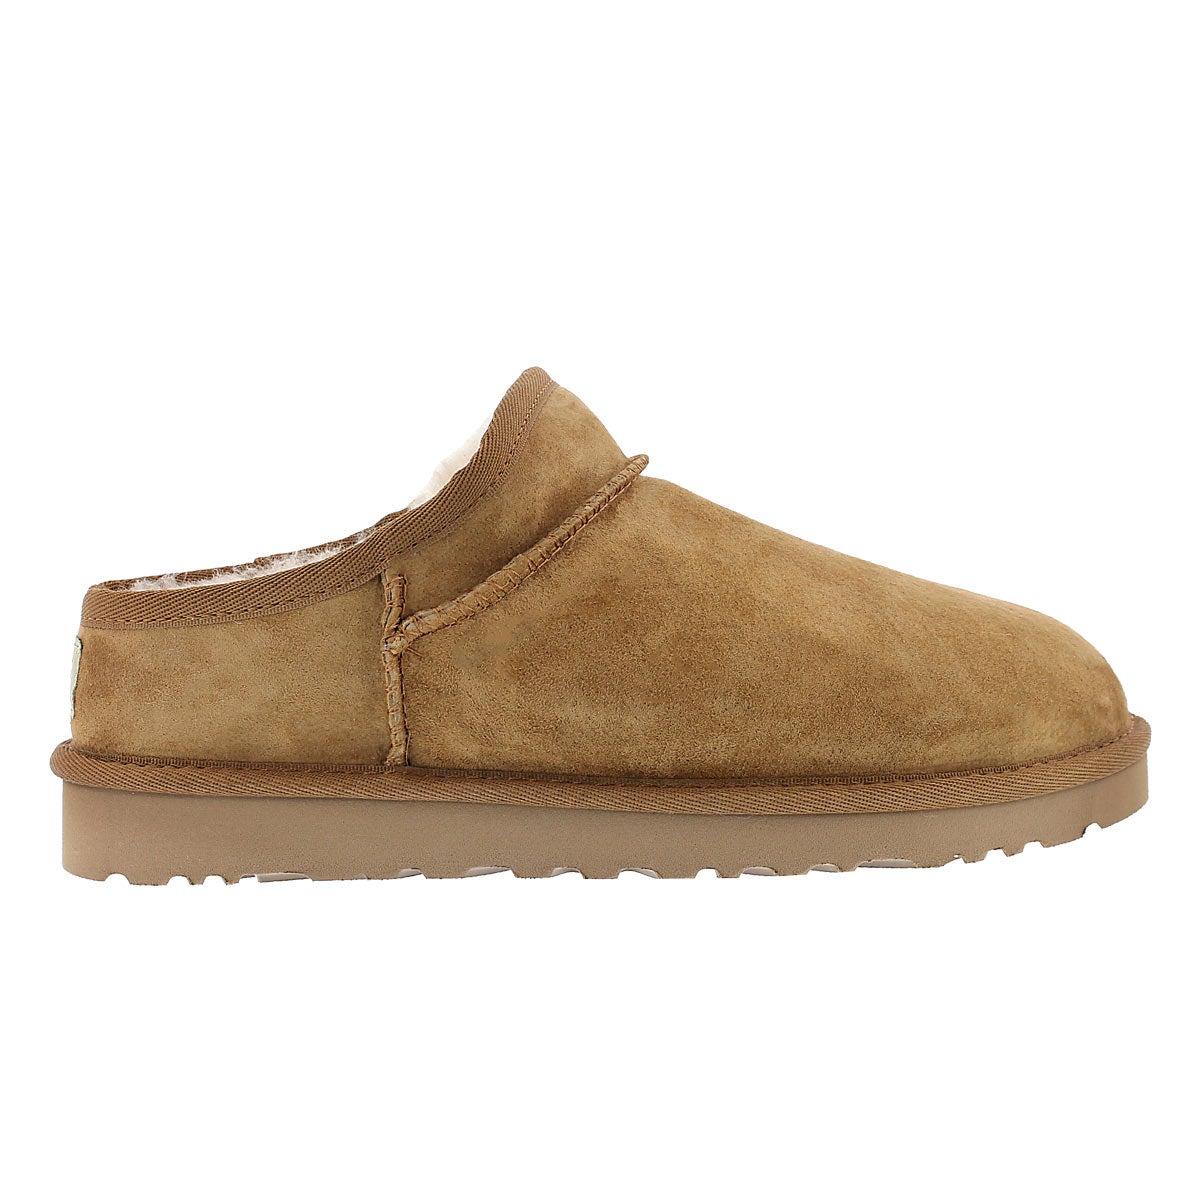 Lds Classic chestnut sheepskin slipper